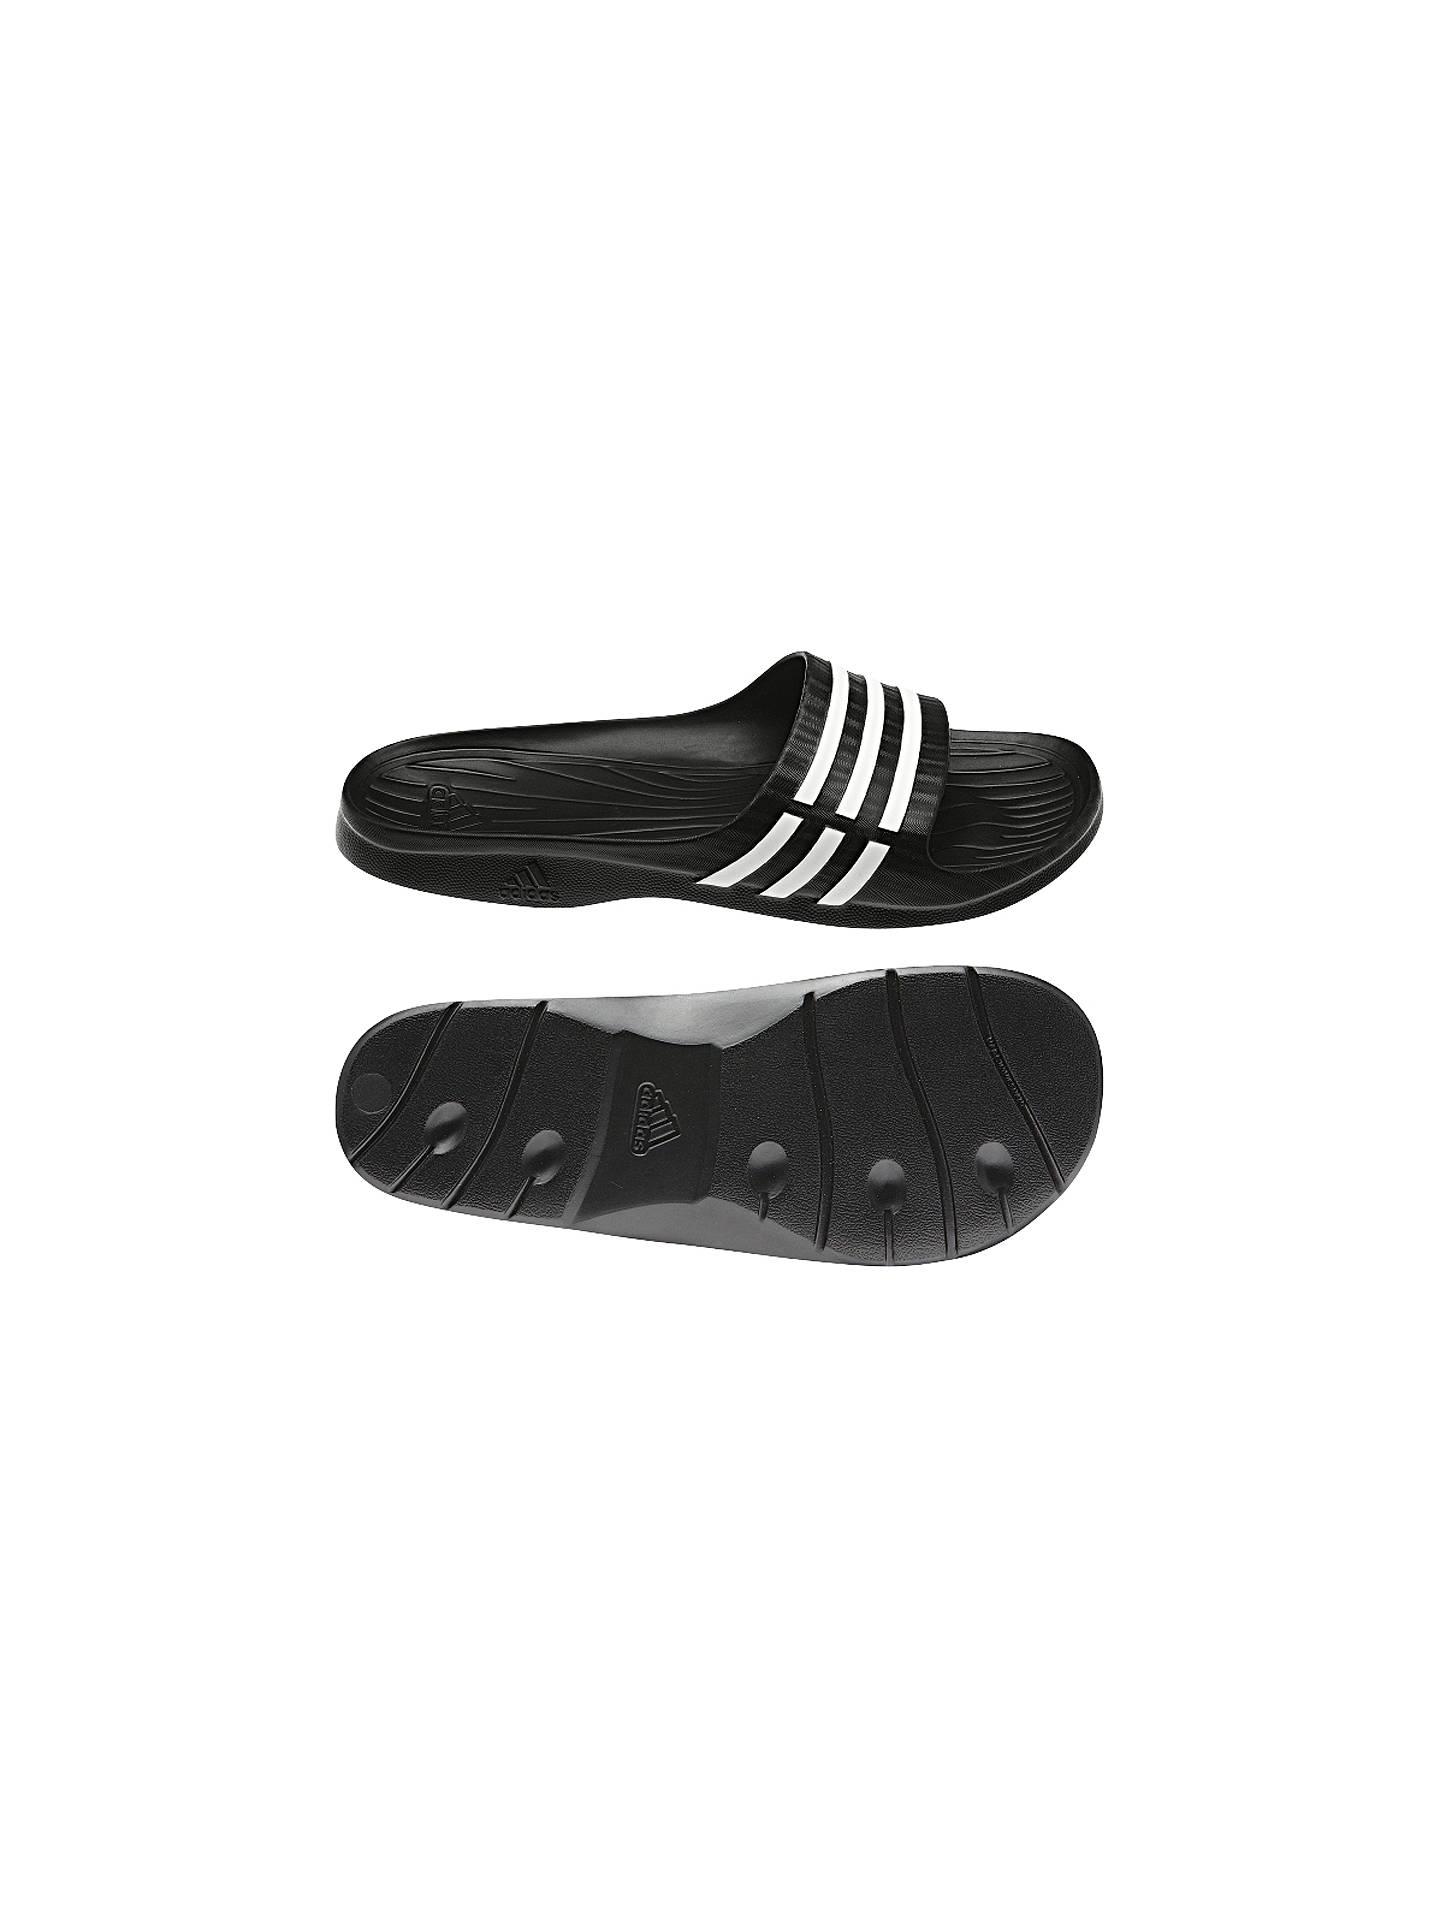 Simple New Womens Adidas Duramo Sleek Slide Flip Flops Comfy Beach Slip On Pool Sandals   EBay